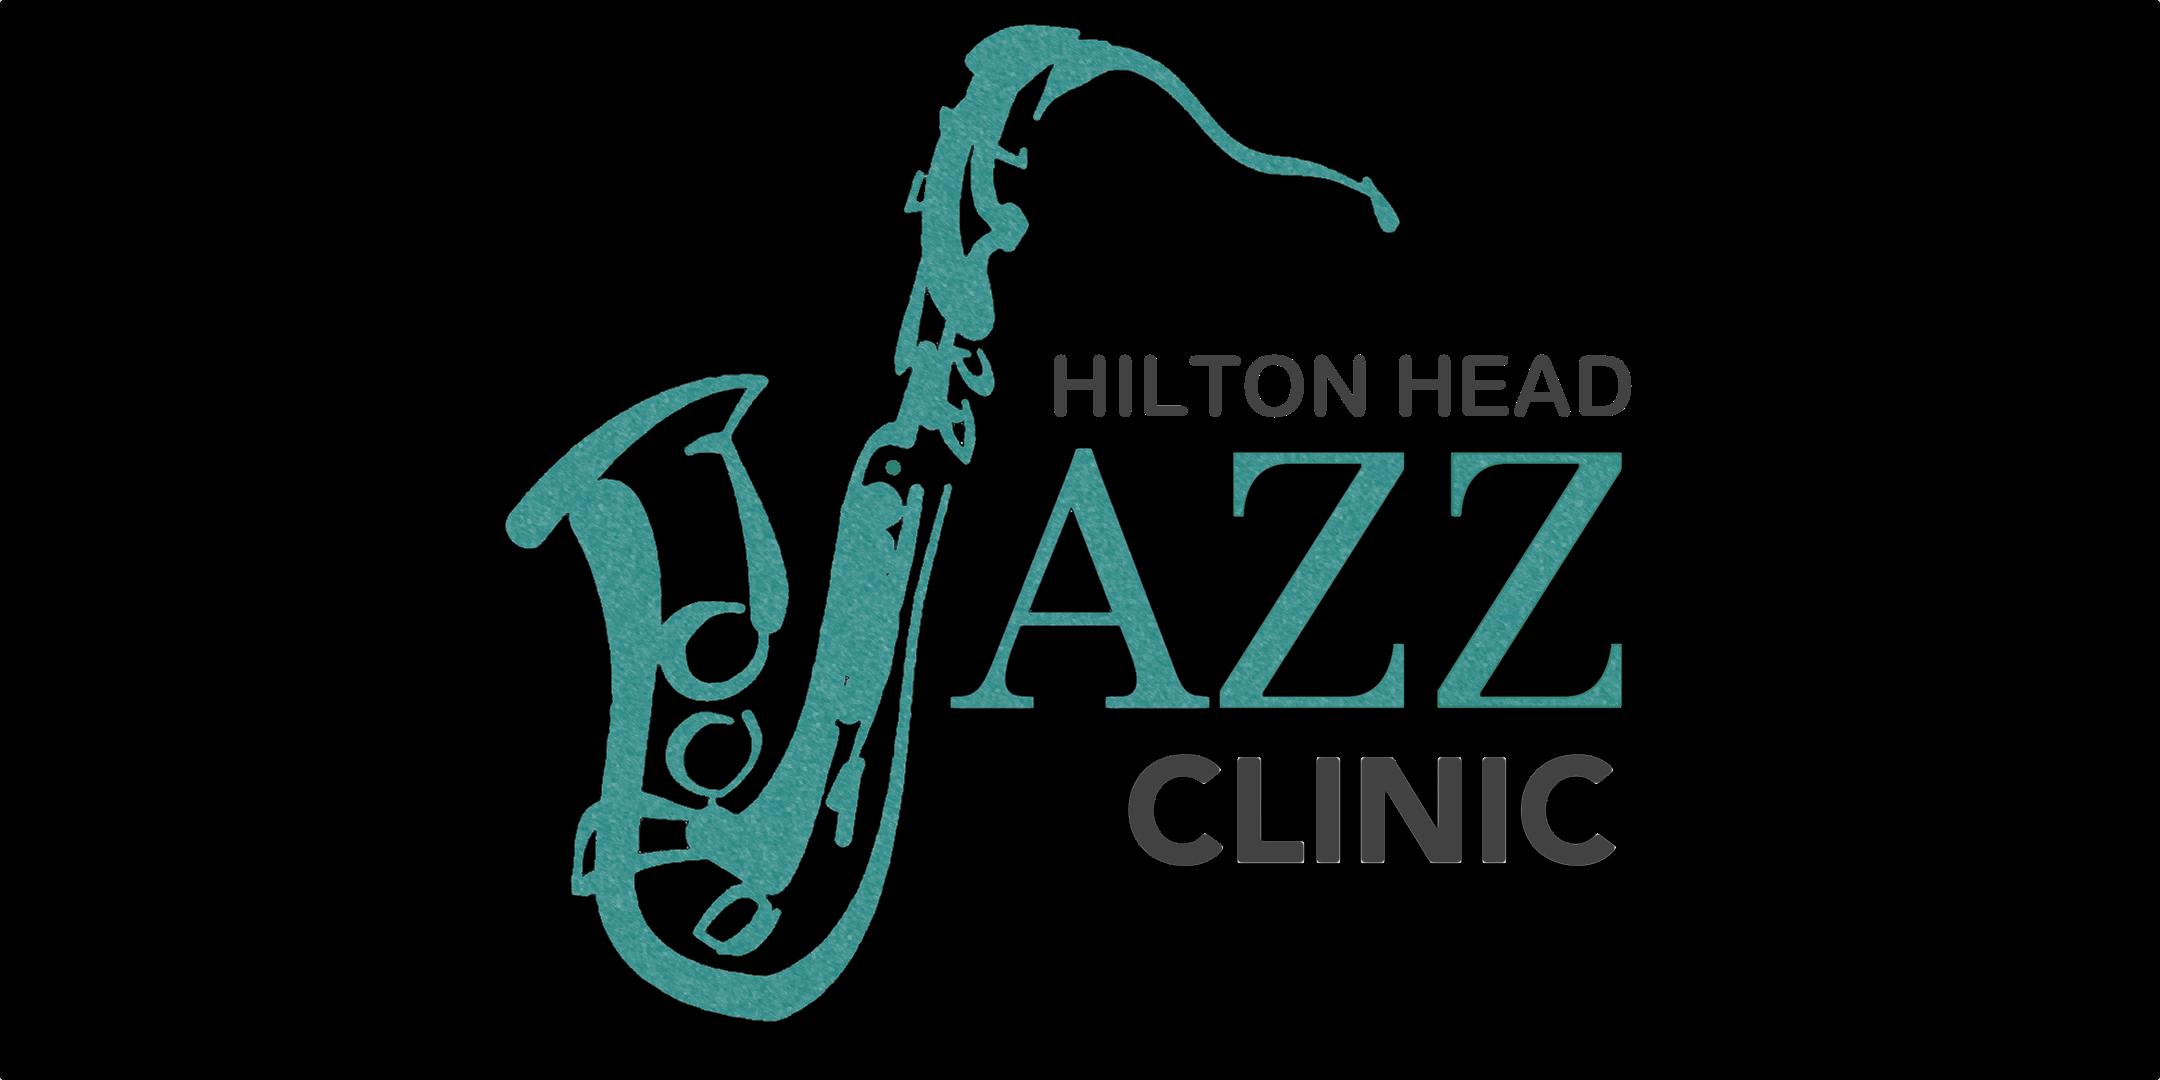 2021 Hilton Head Jazz Clinic